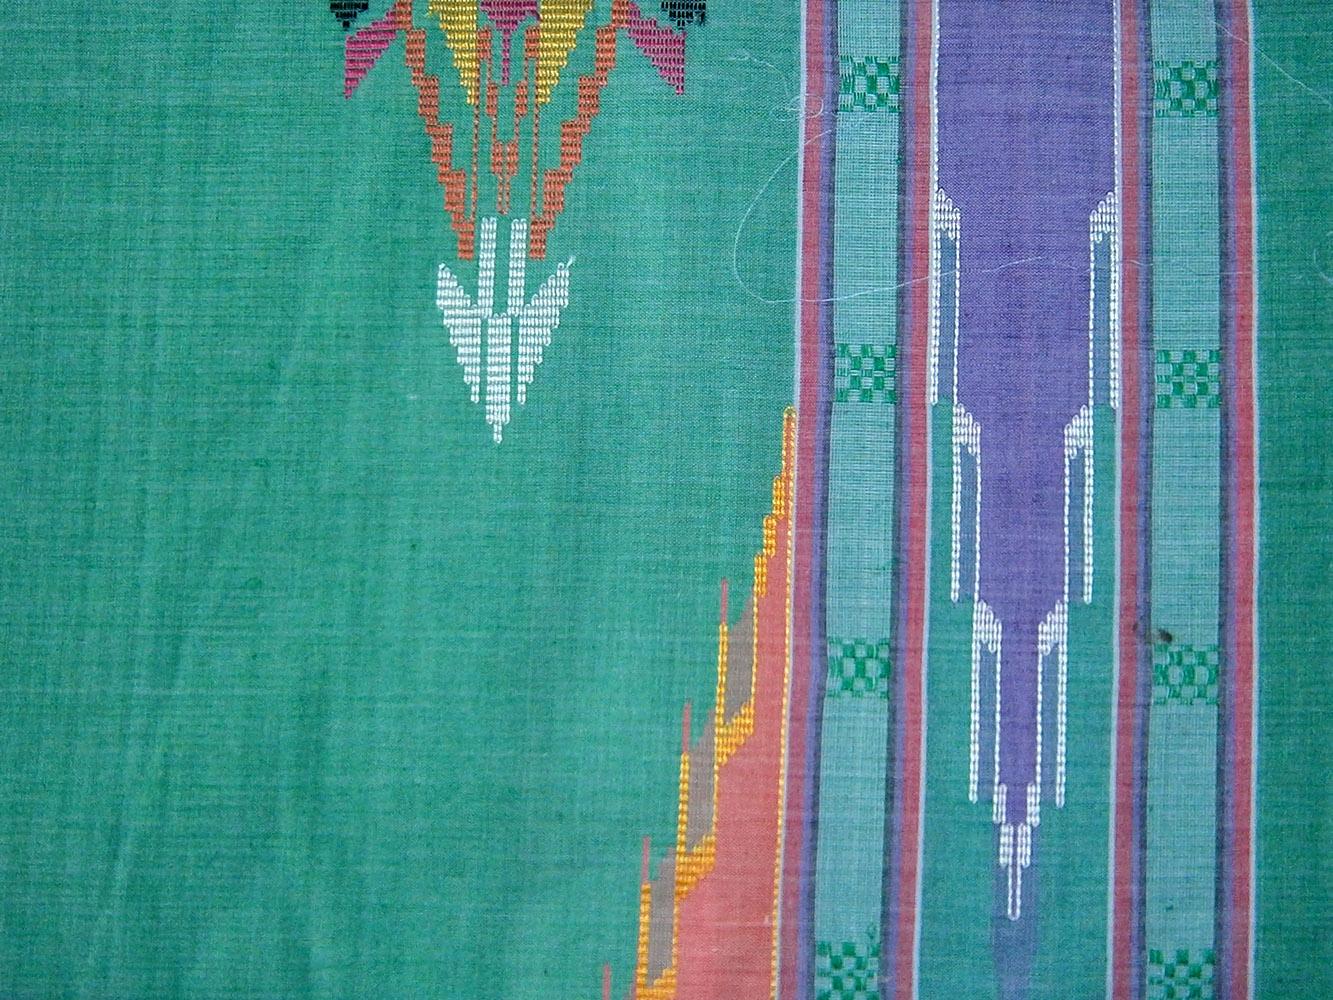 ... teknik songket, terkadang juga di lekatkan pada kain doby, yakni kain